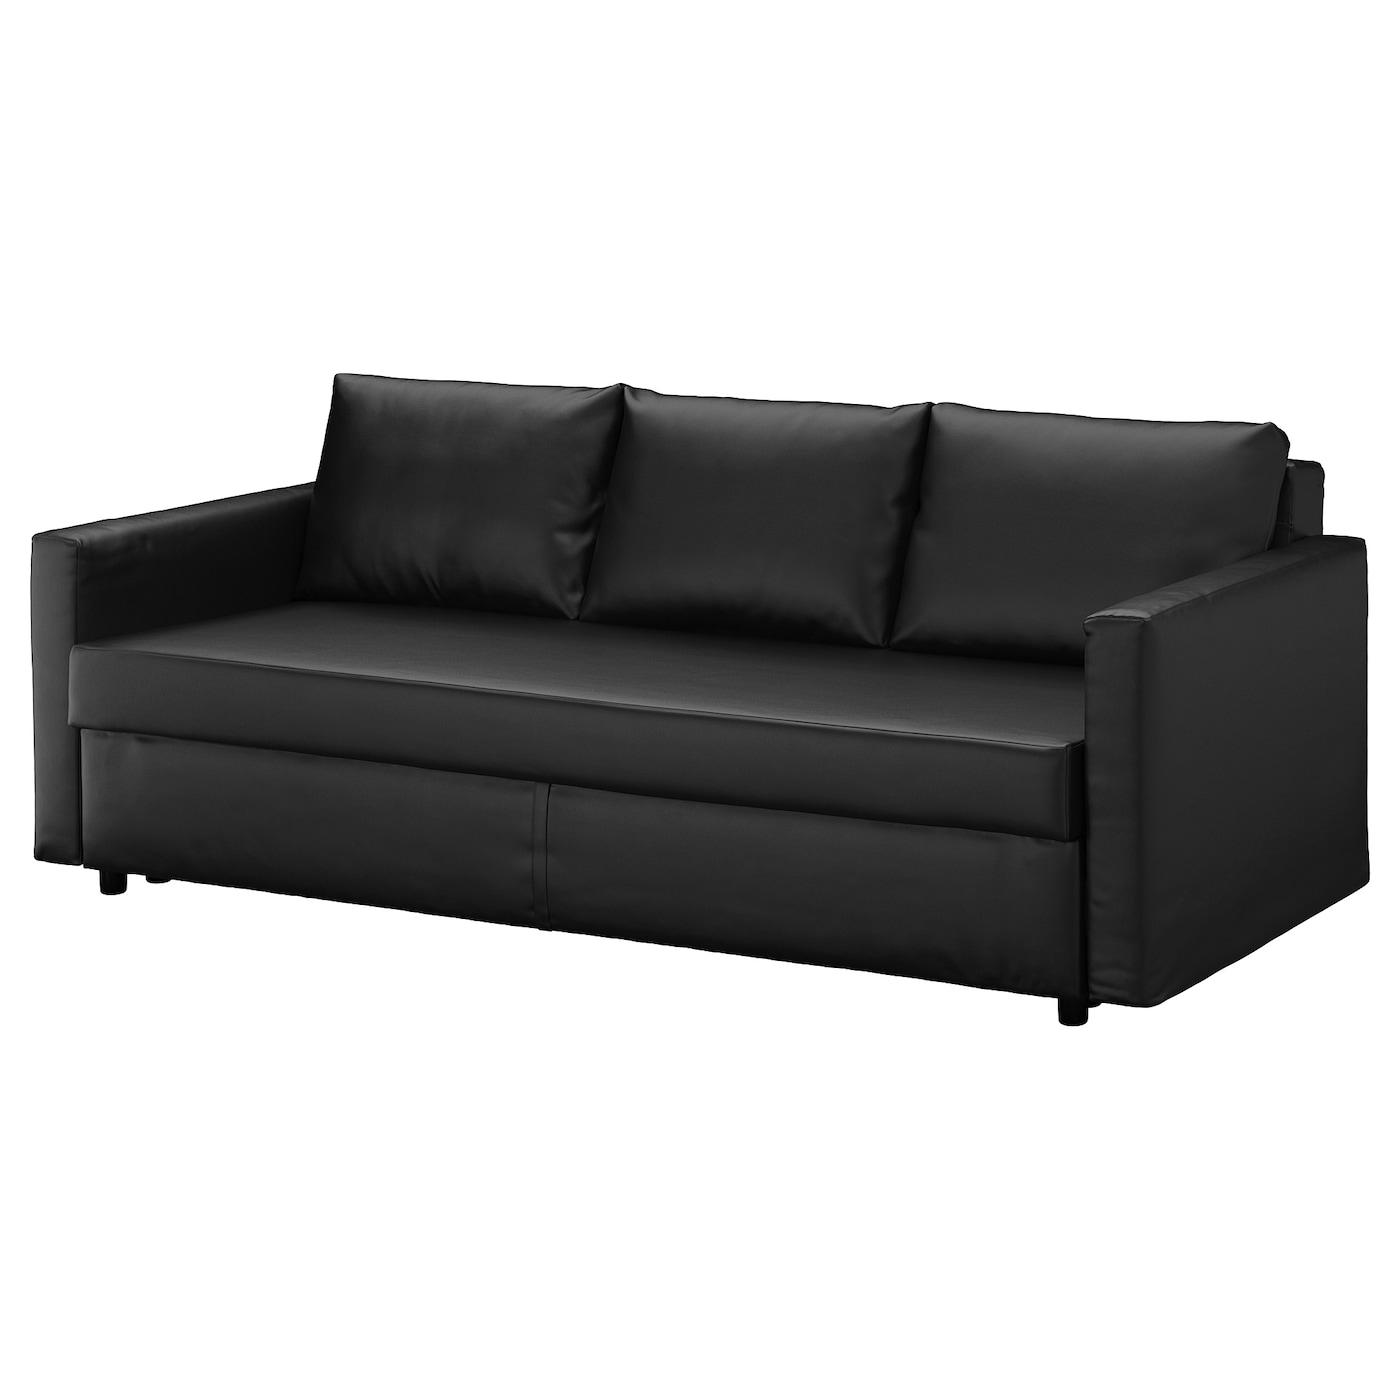 Friheten Bomstad Black Three Seat Sofa Bed Ikea